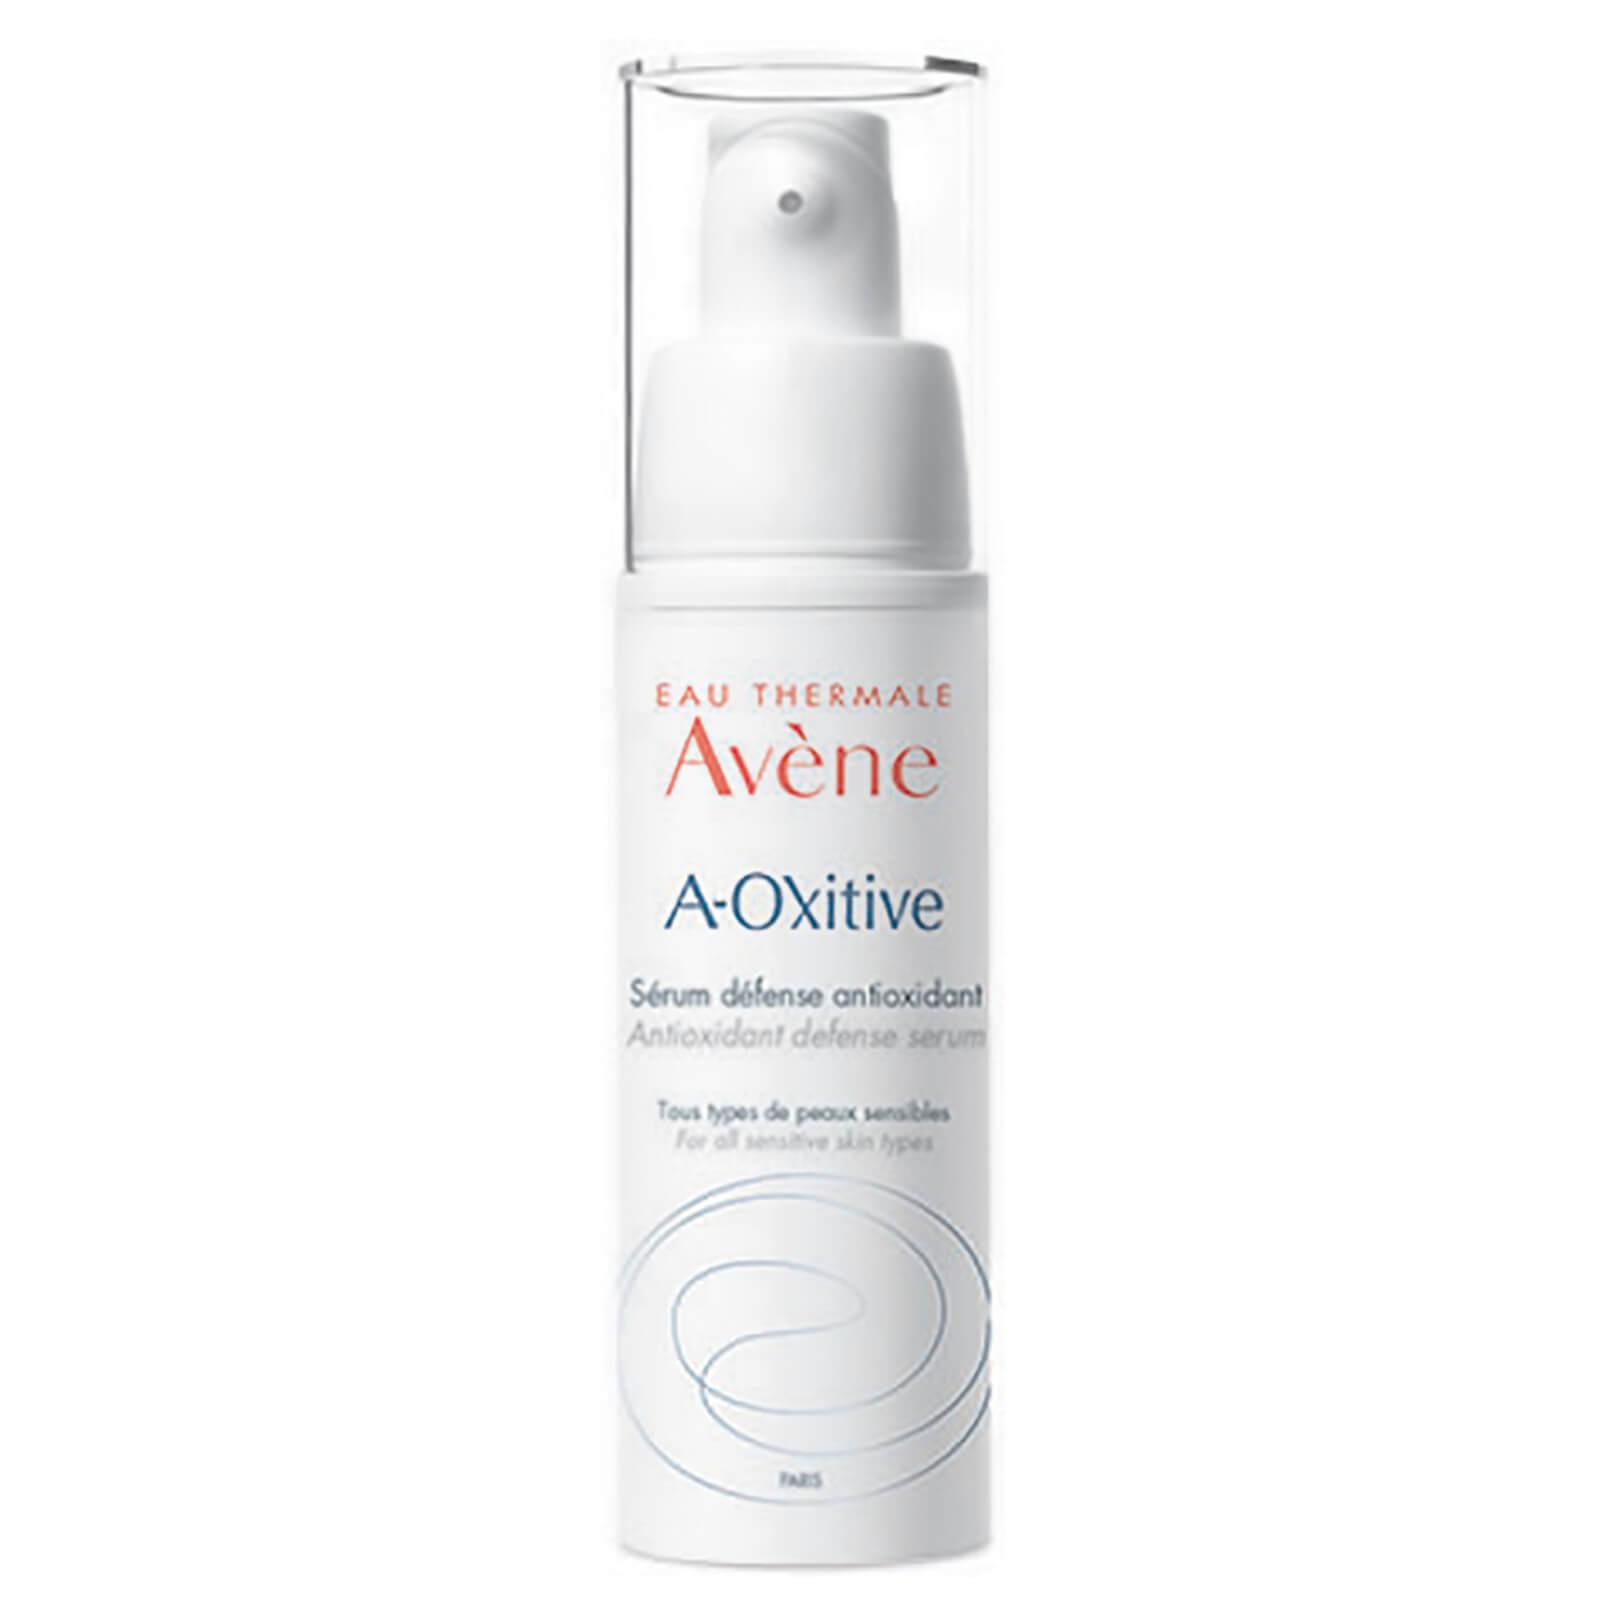 AVENE A-OXITIVE SIERO DIFESA ANTI-OSSIDANTE Flacone dispenser airless 30 ml